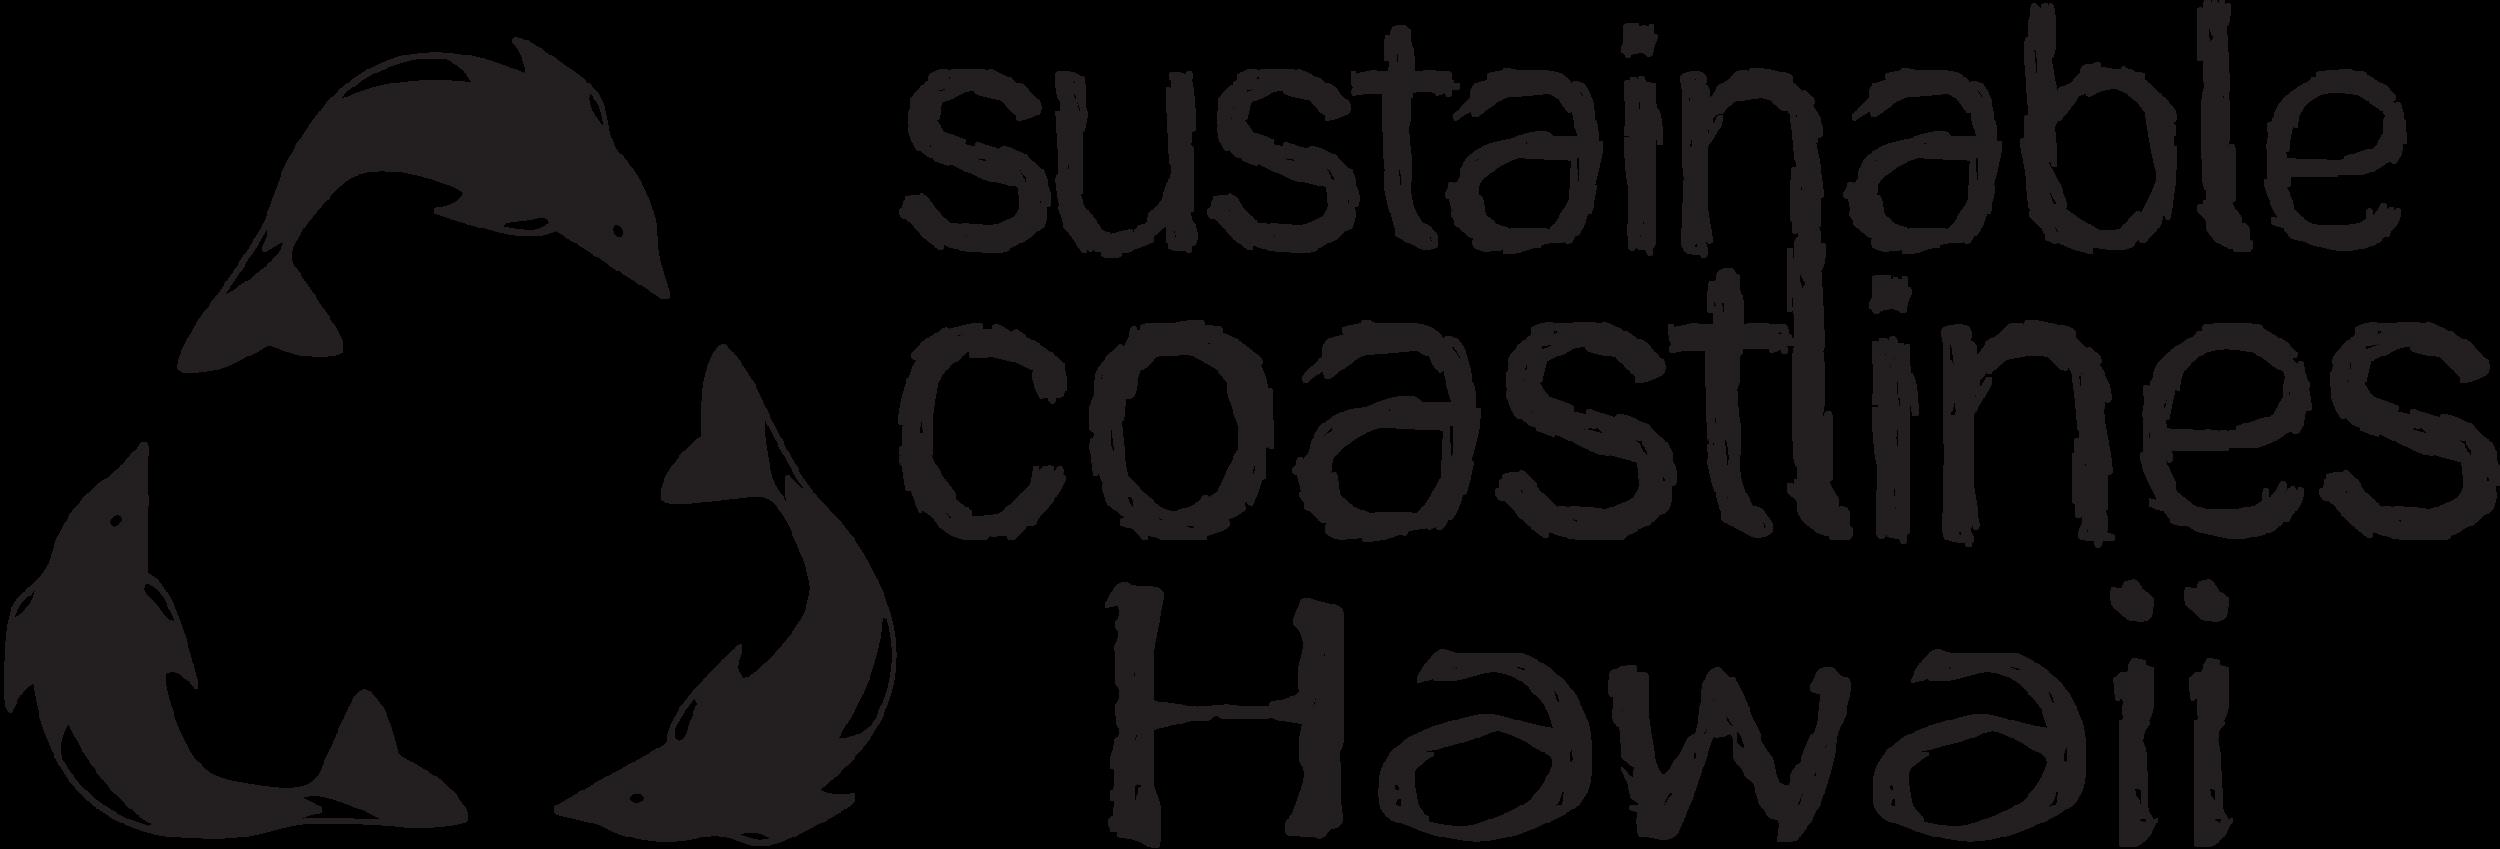 sustainable_coastlines_hawaii_logo.png